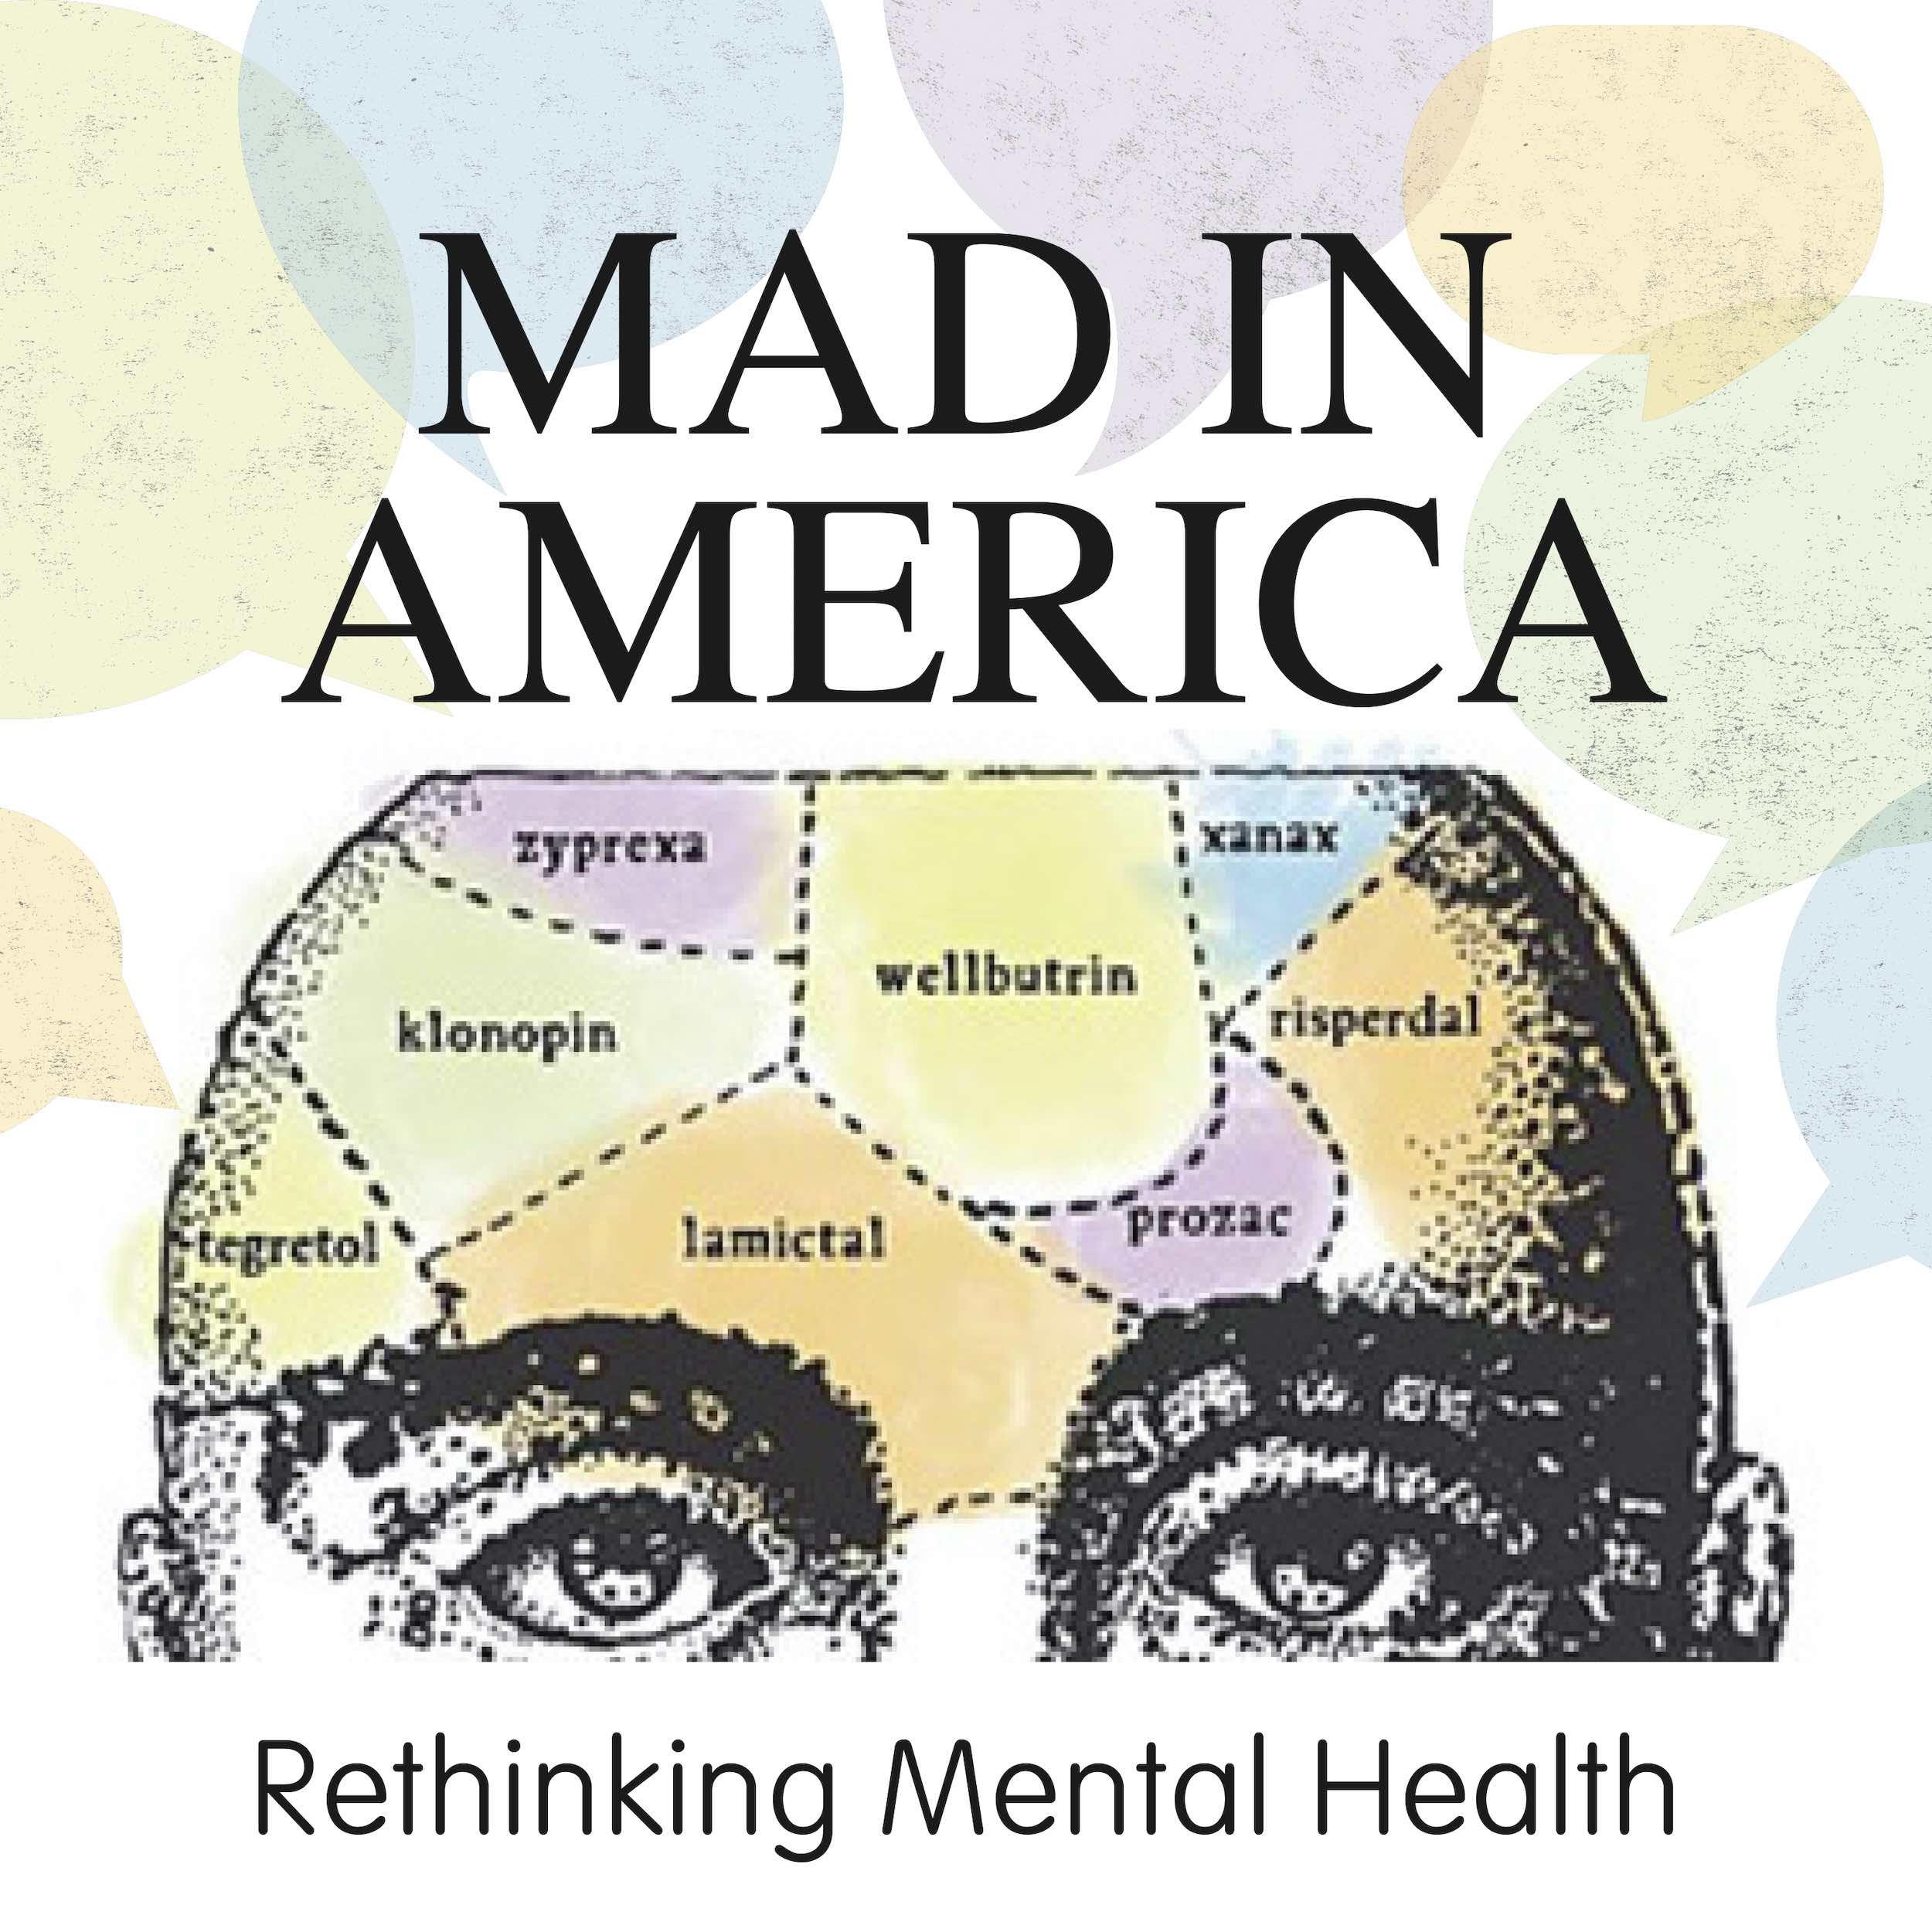 Mad in America: Rethinking Mental Health - Jim Wright - World Benzodiazepine Awareness Day 2020